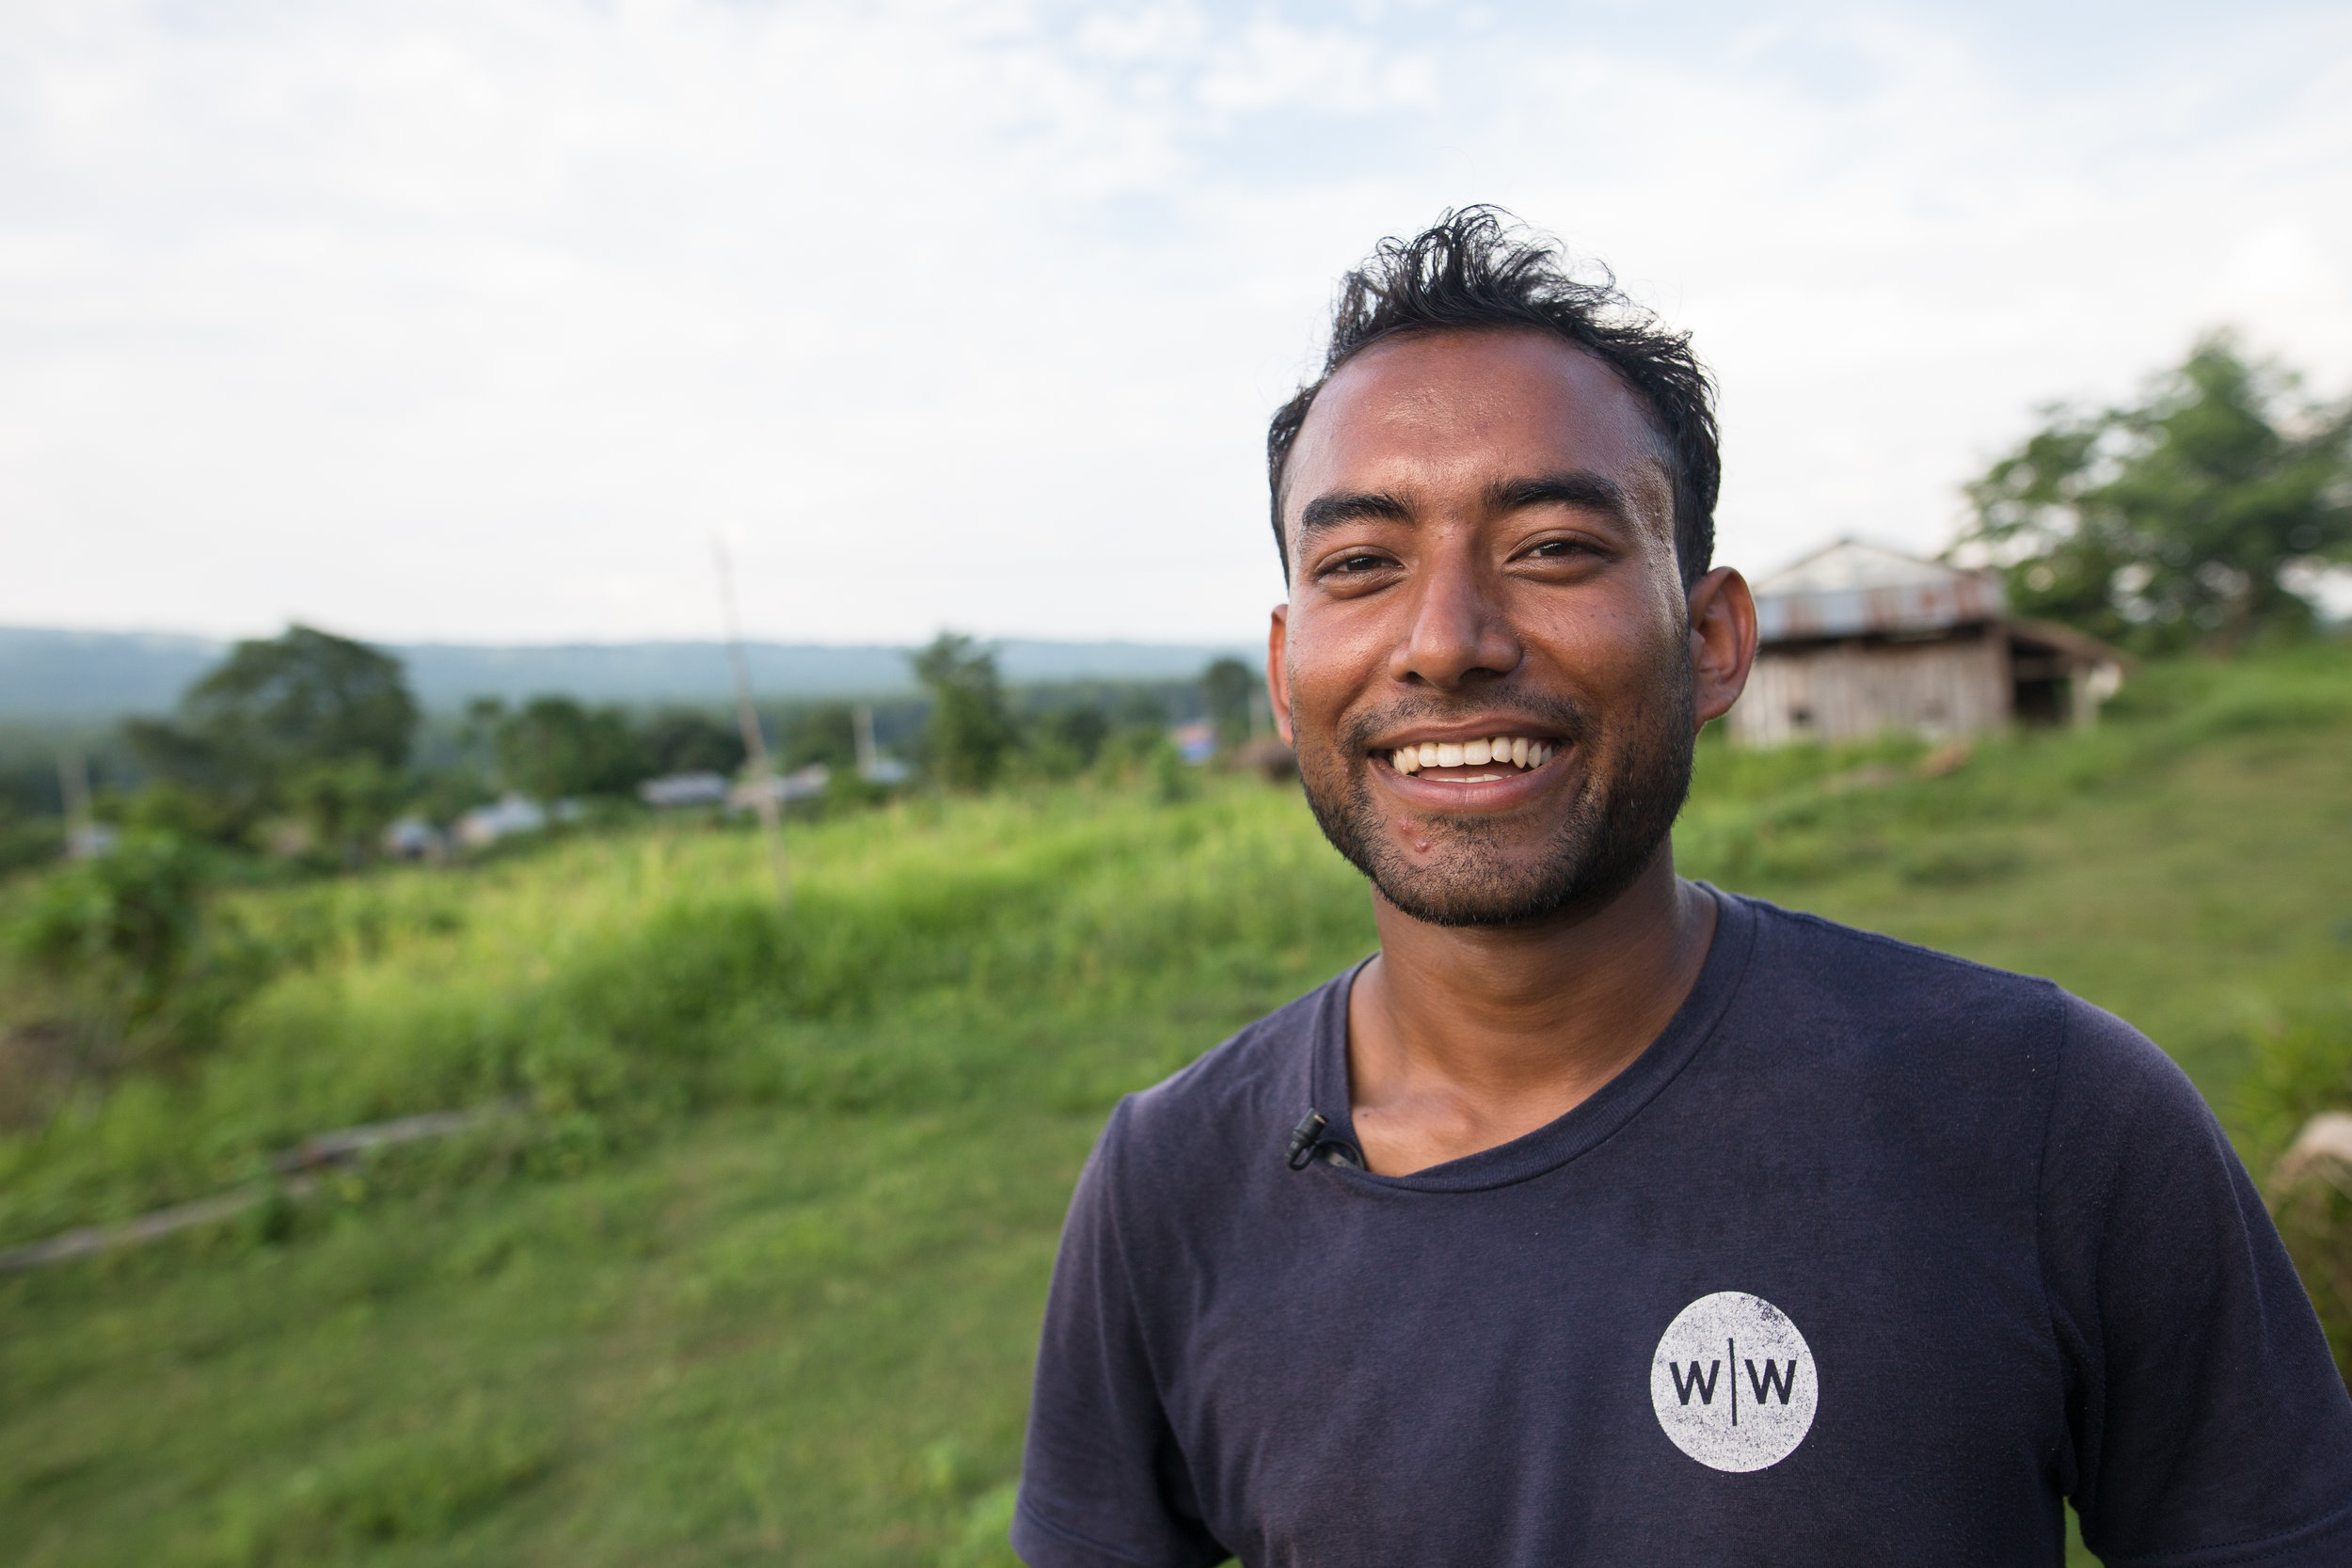 Abhishek Basnet shares his story while trekking through the Raitole community.